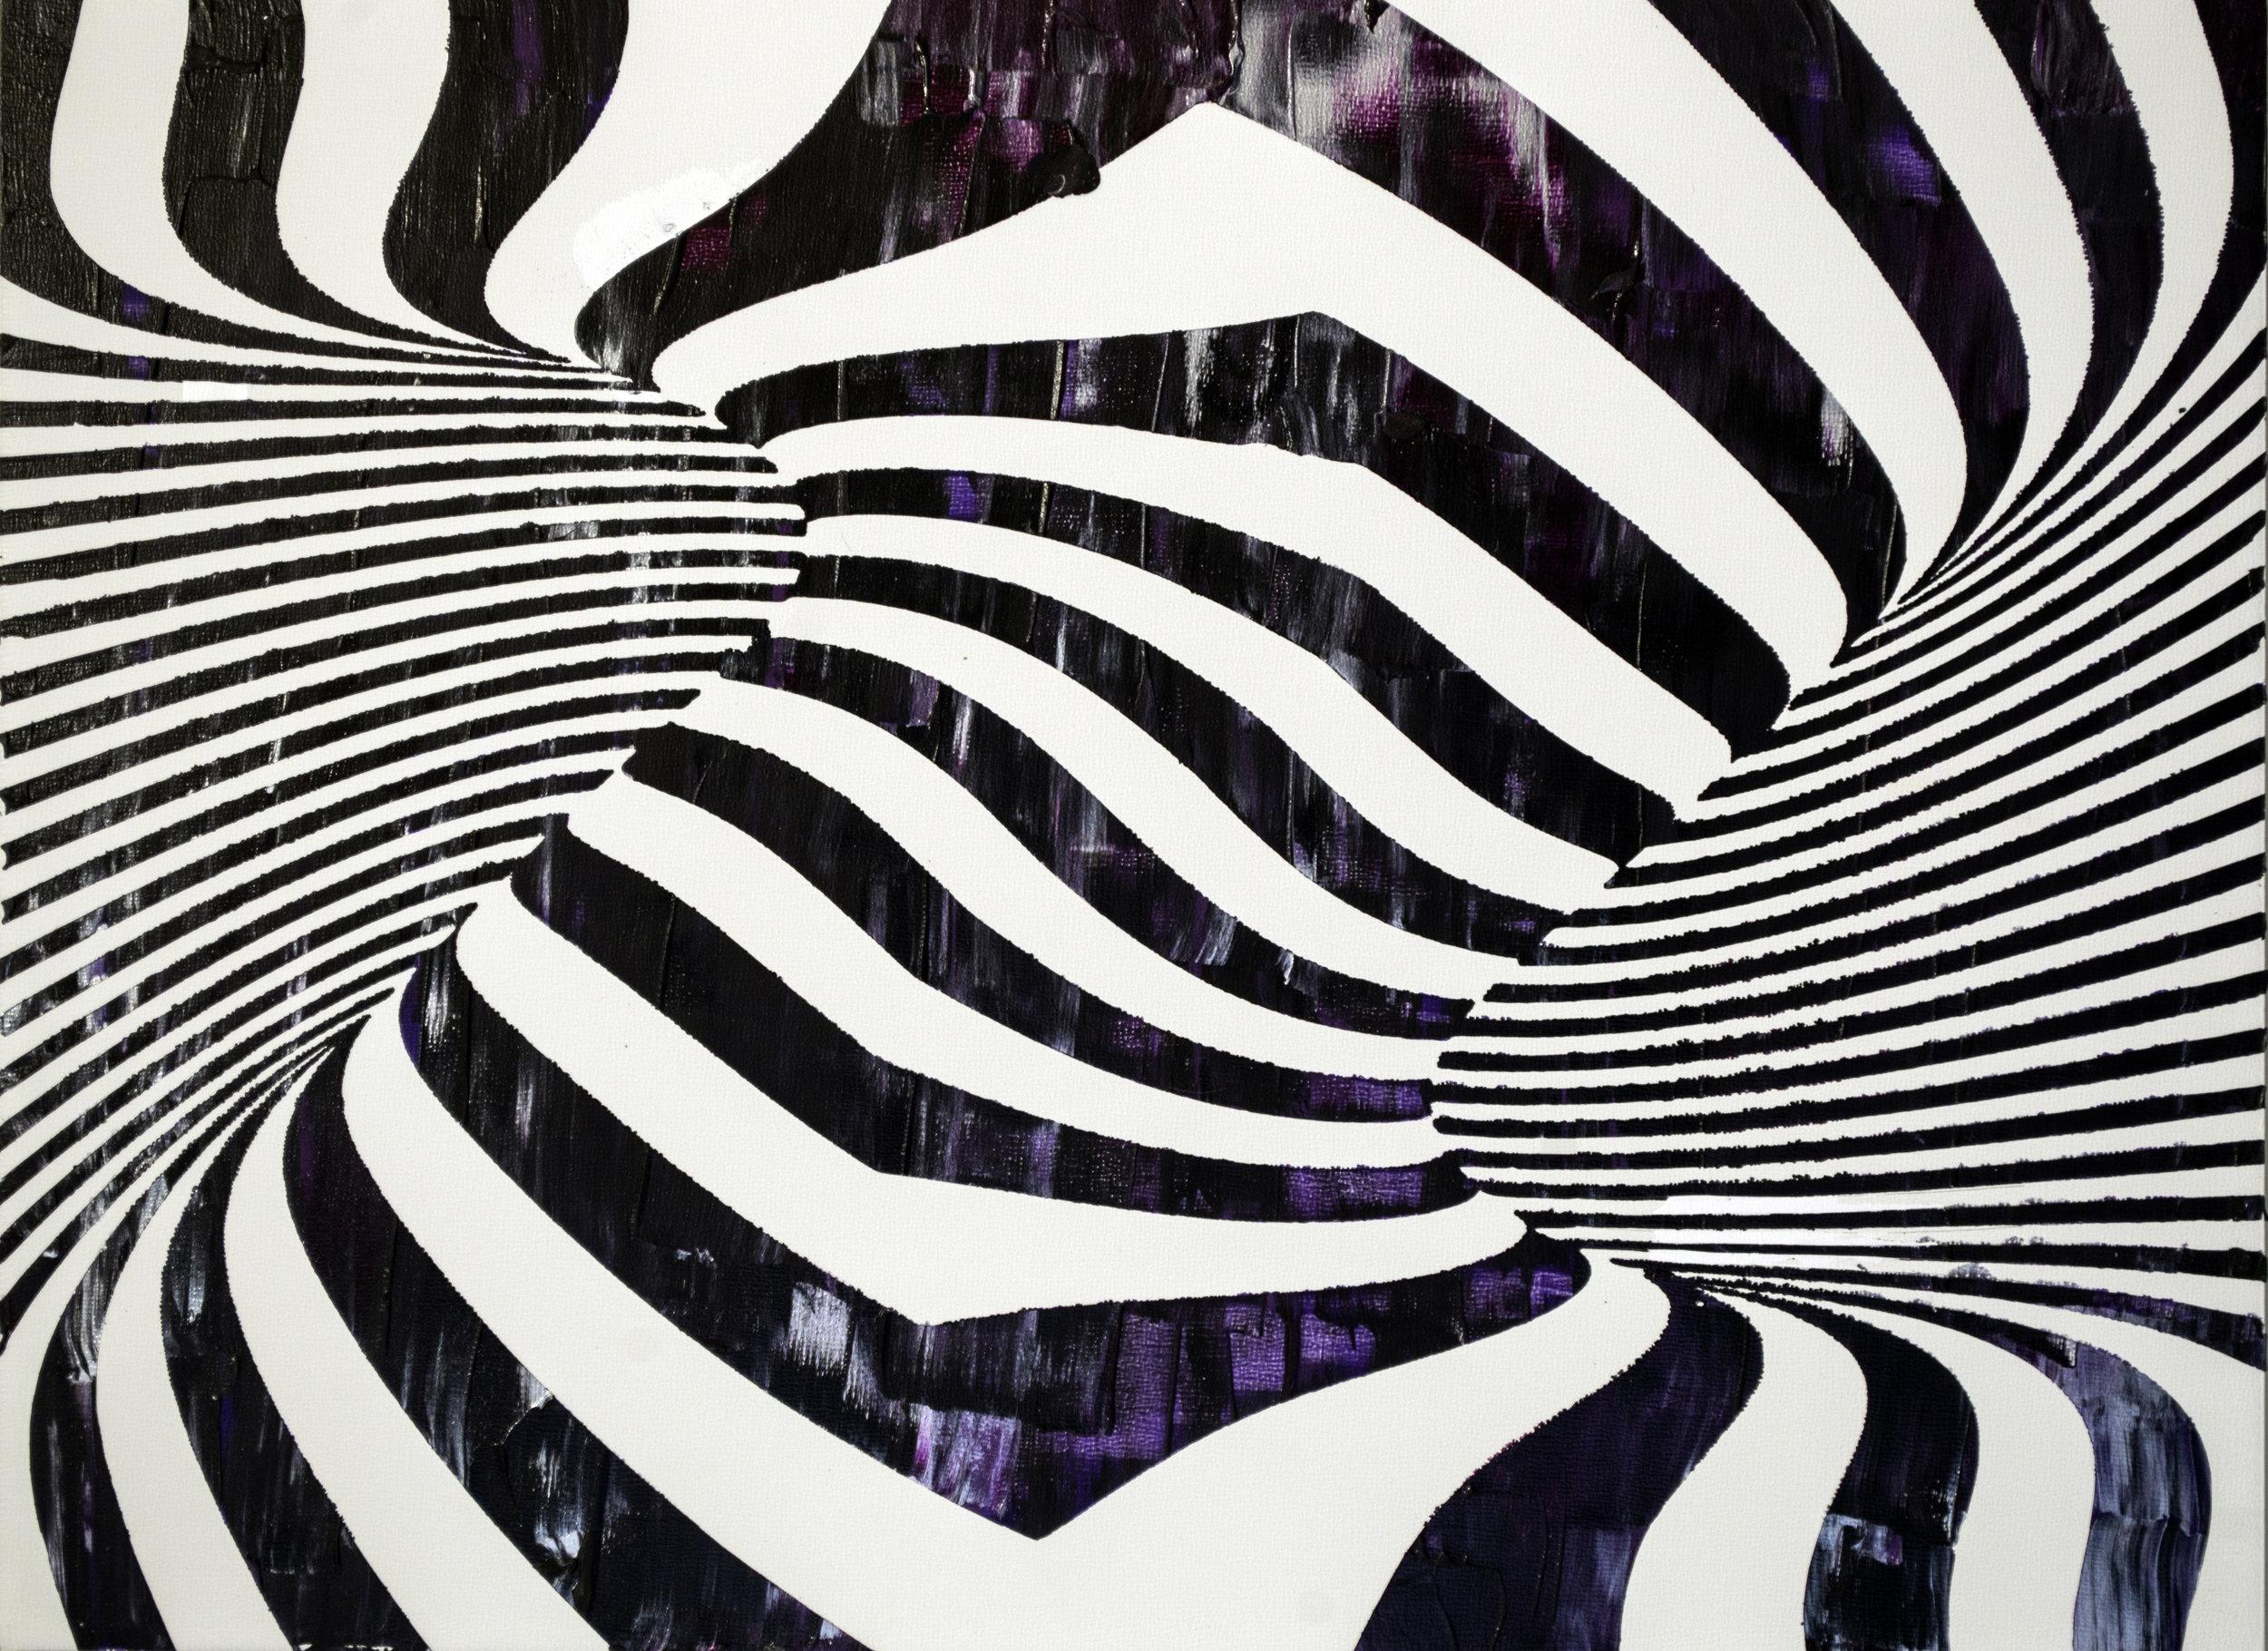 HUE Gallery of Contemporary Art - Sean Christopher Ward - Burton_s Tornado - Acrylic on MDF - 12x16 - 2019 - $375.jpg